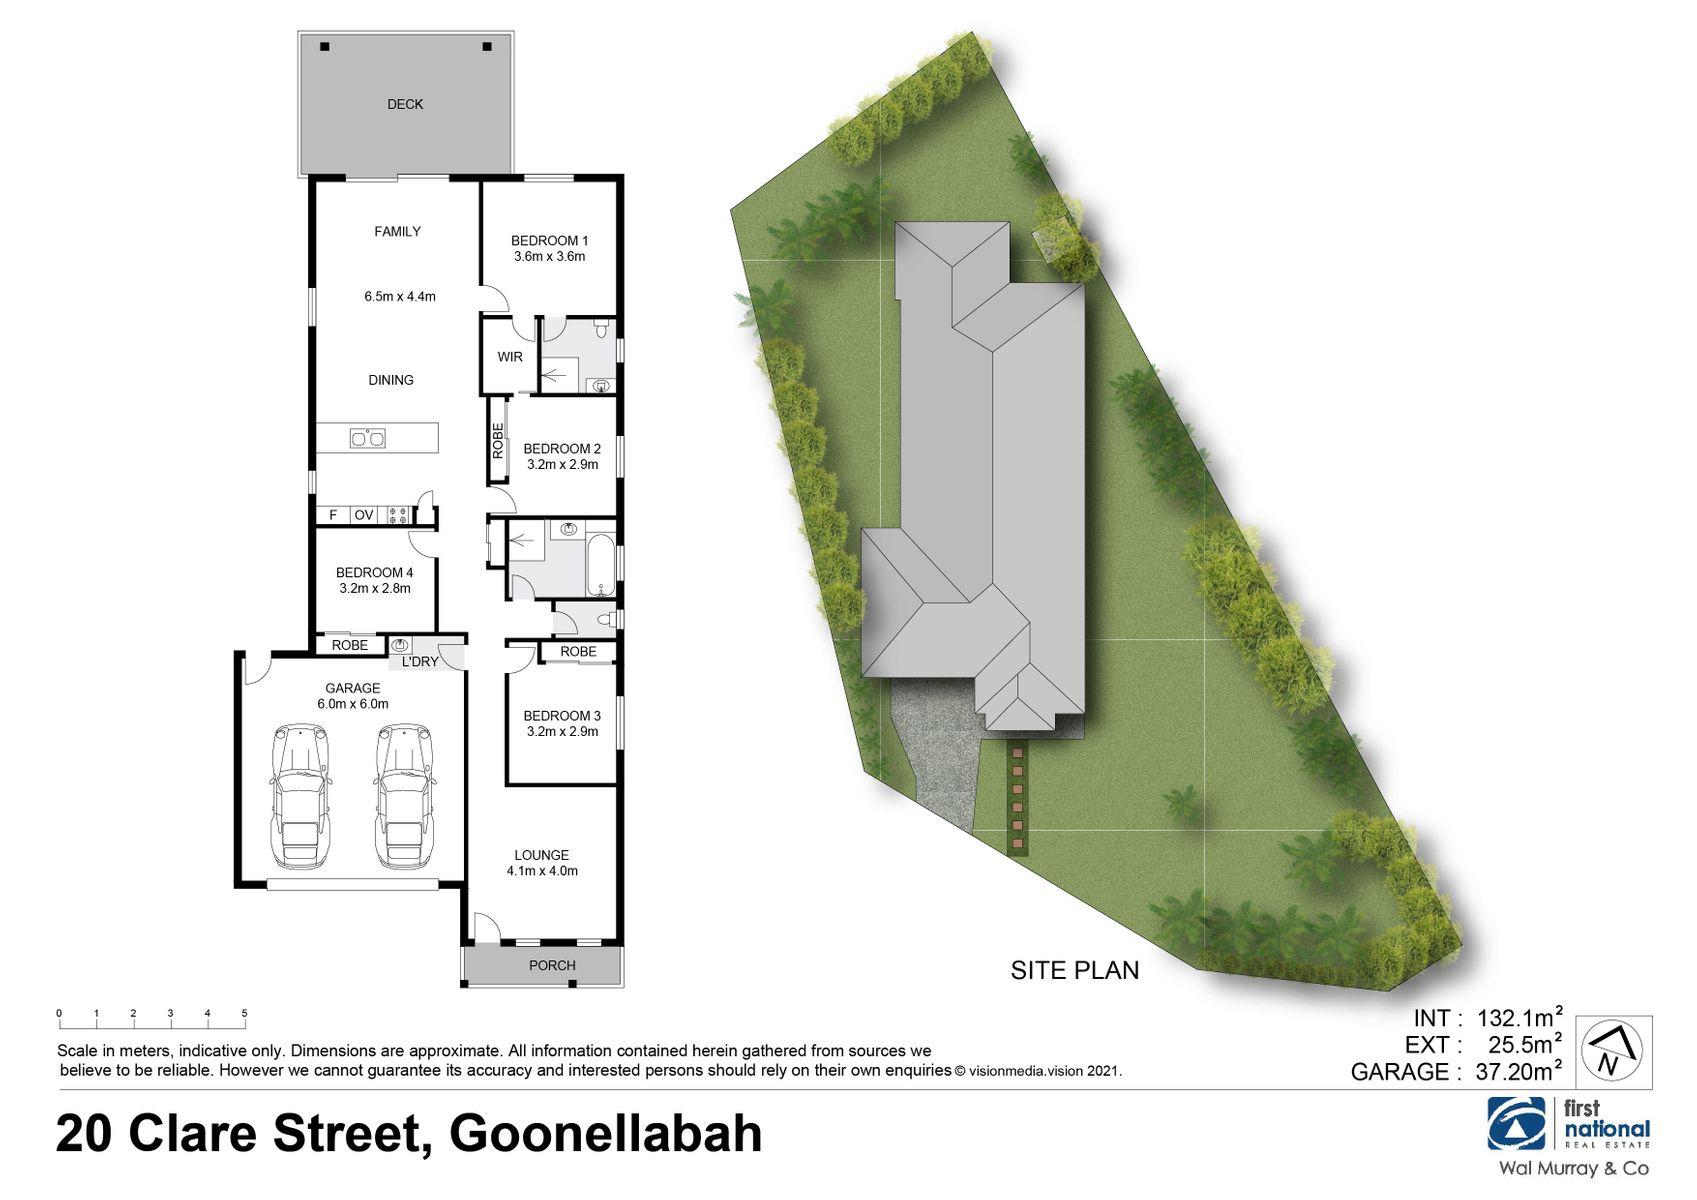 20 Clare Street, Goonellabah, NSW 2480